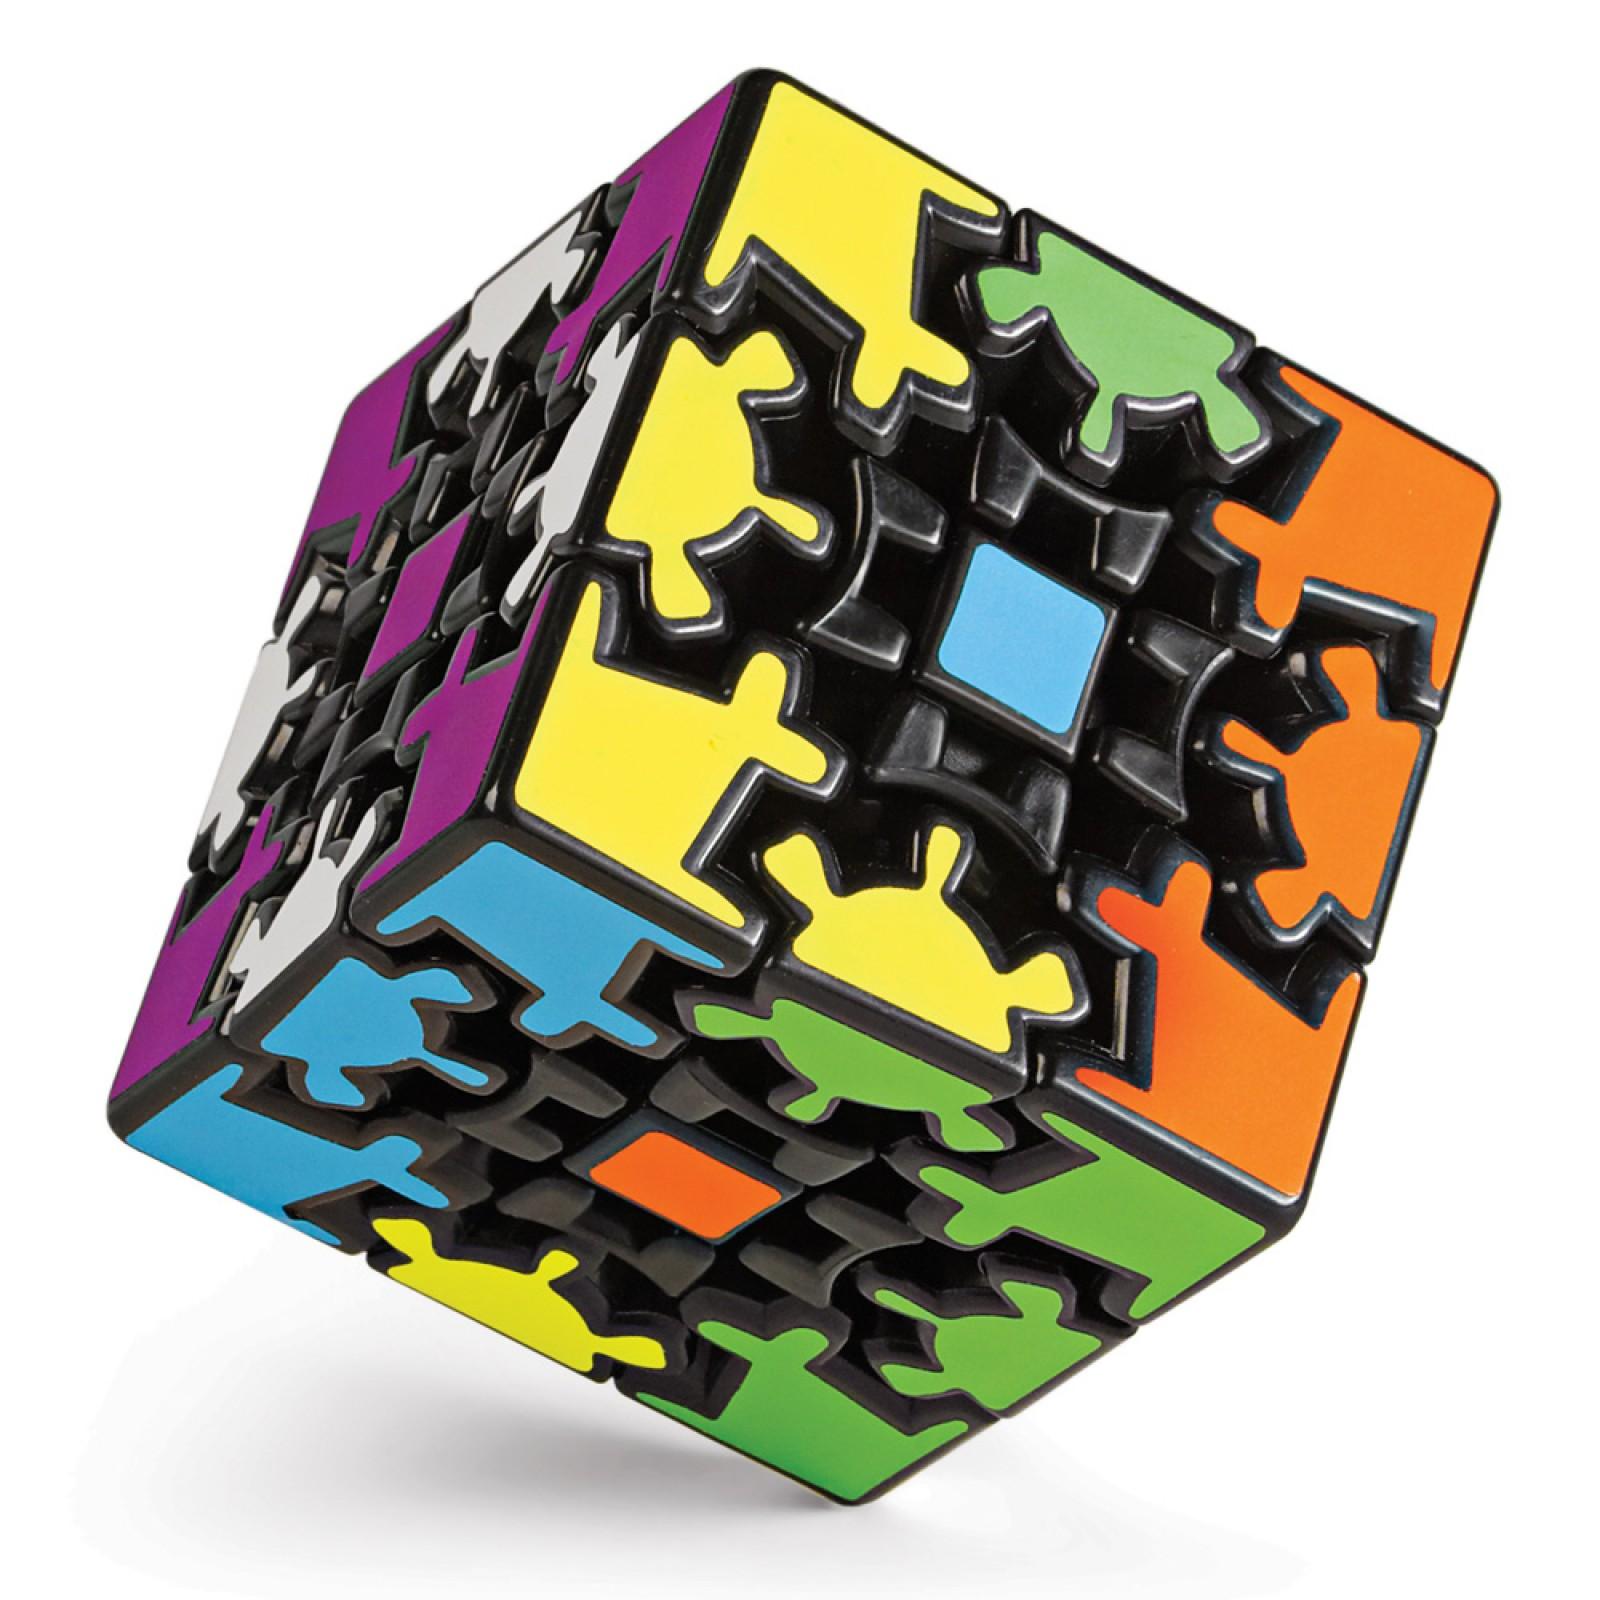 Kocka s prevodovkou Gear Cube